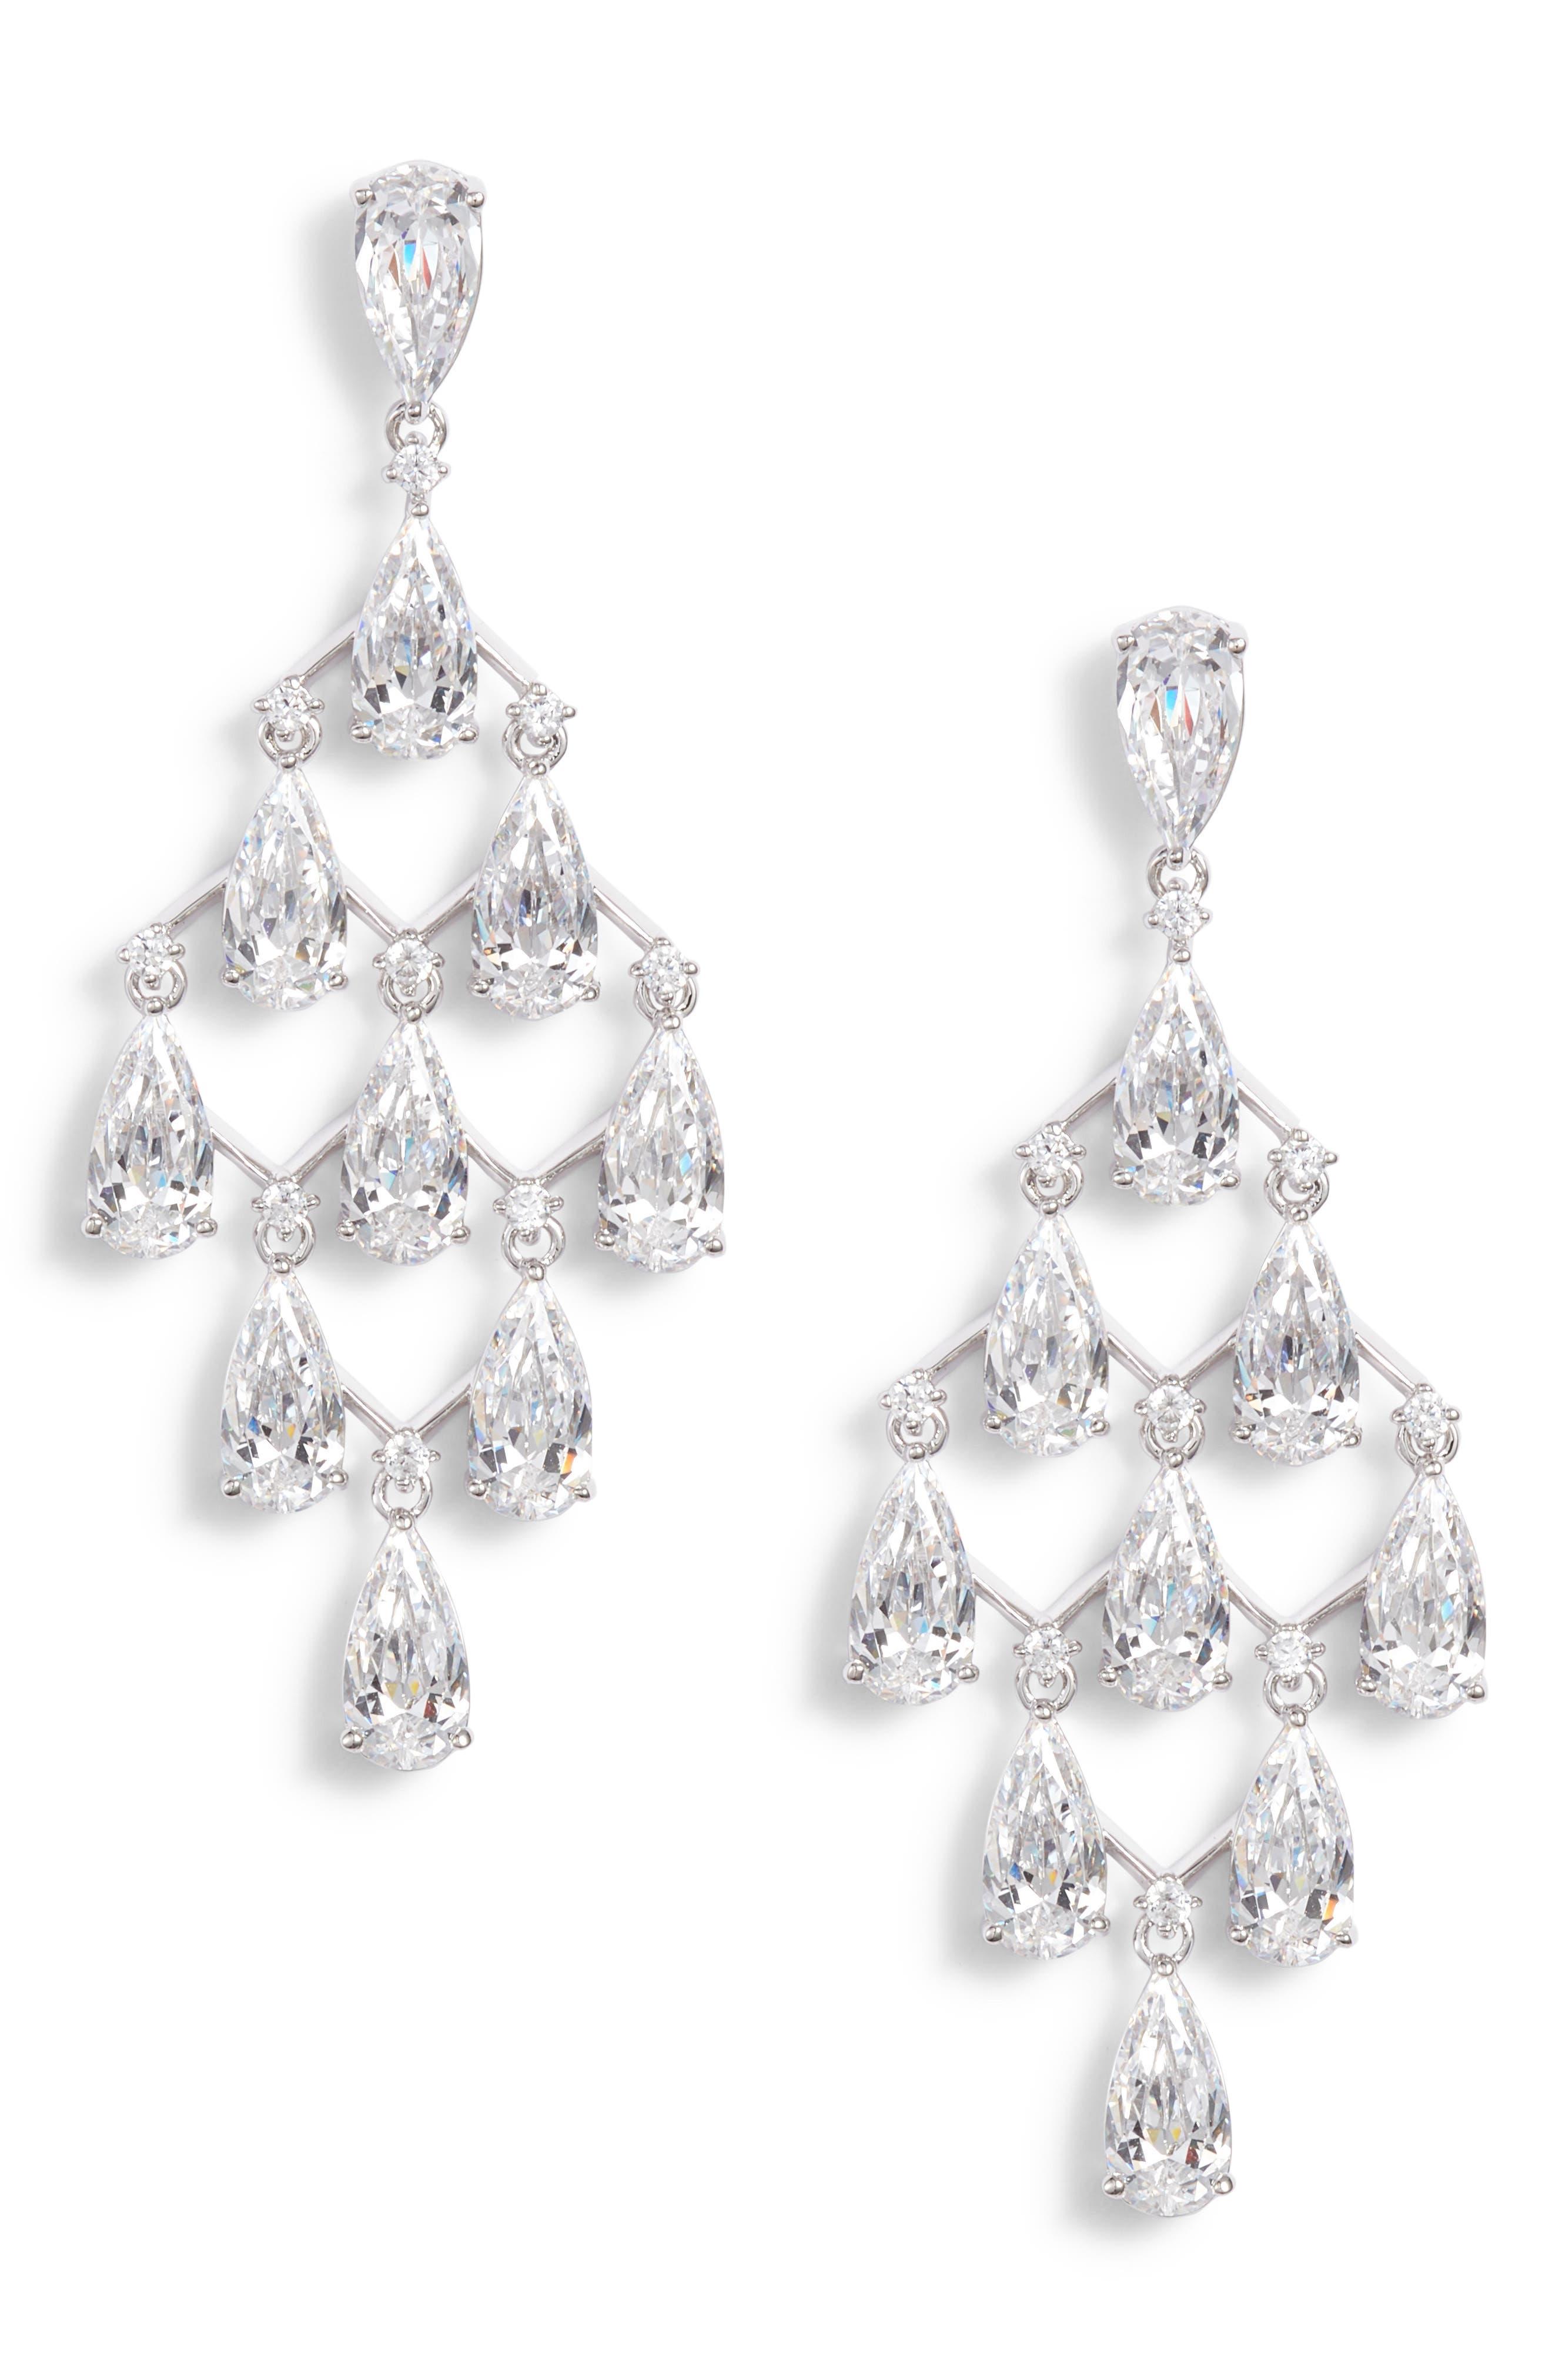 Kite Chandelier Earrings,                             Main thumbnail 1, color,                             Silver